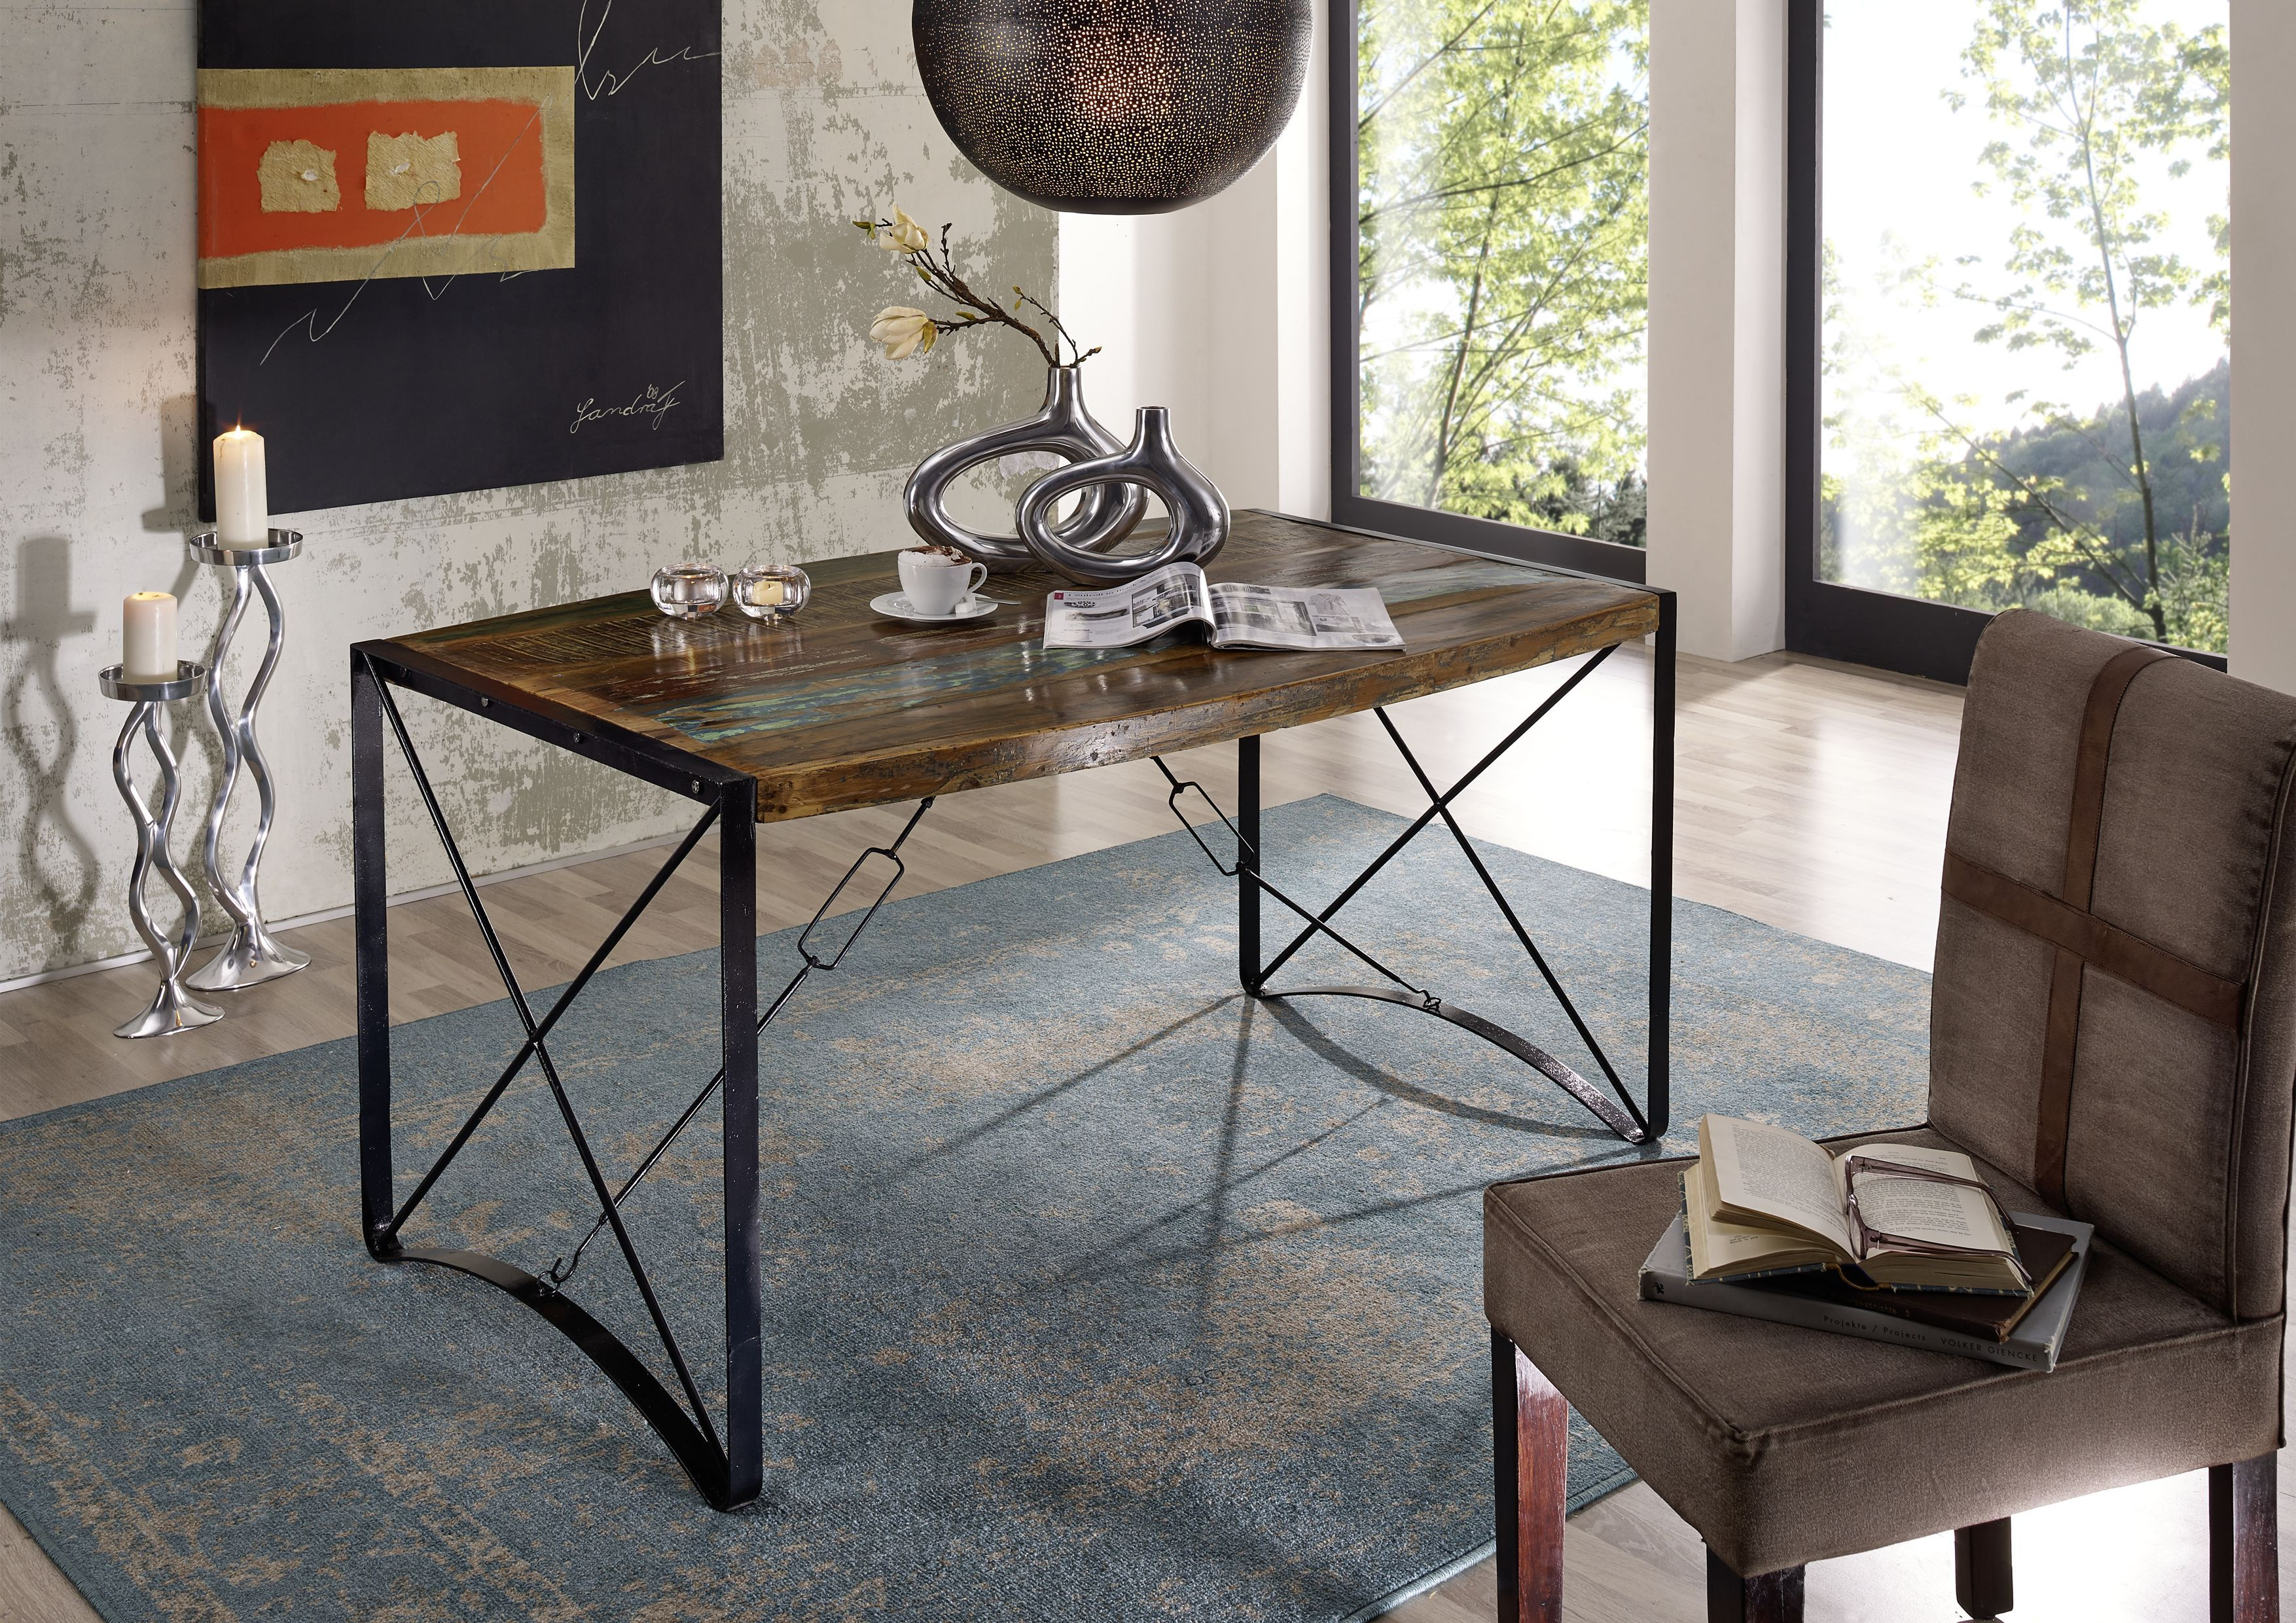 Möbel Altholz lackiert mehrfarbig INDUSTRIAL Massivholz | Pinterest ...